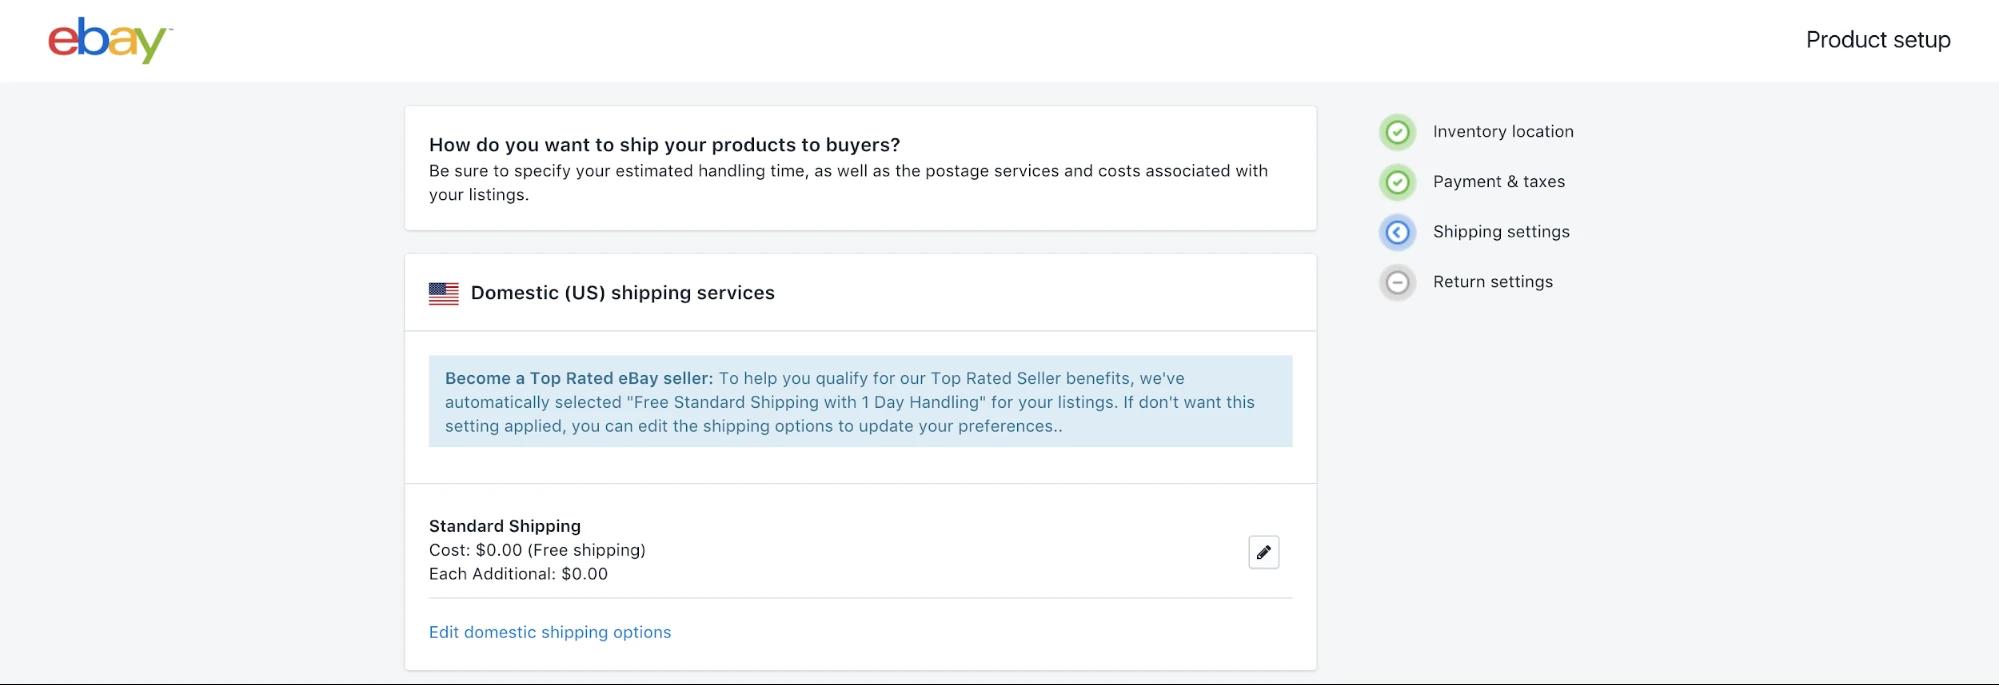 Configure your eBay policies - Shopify eBay integration